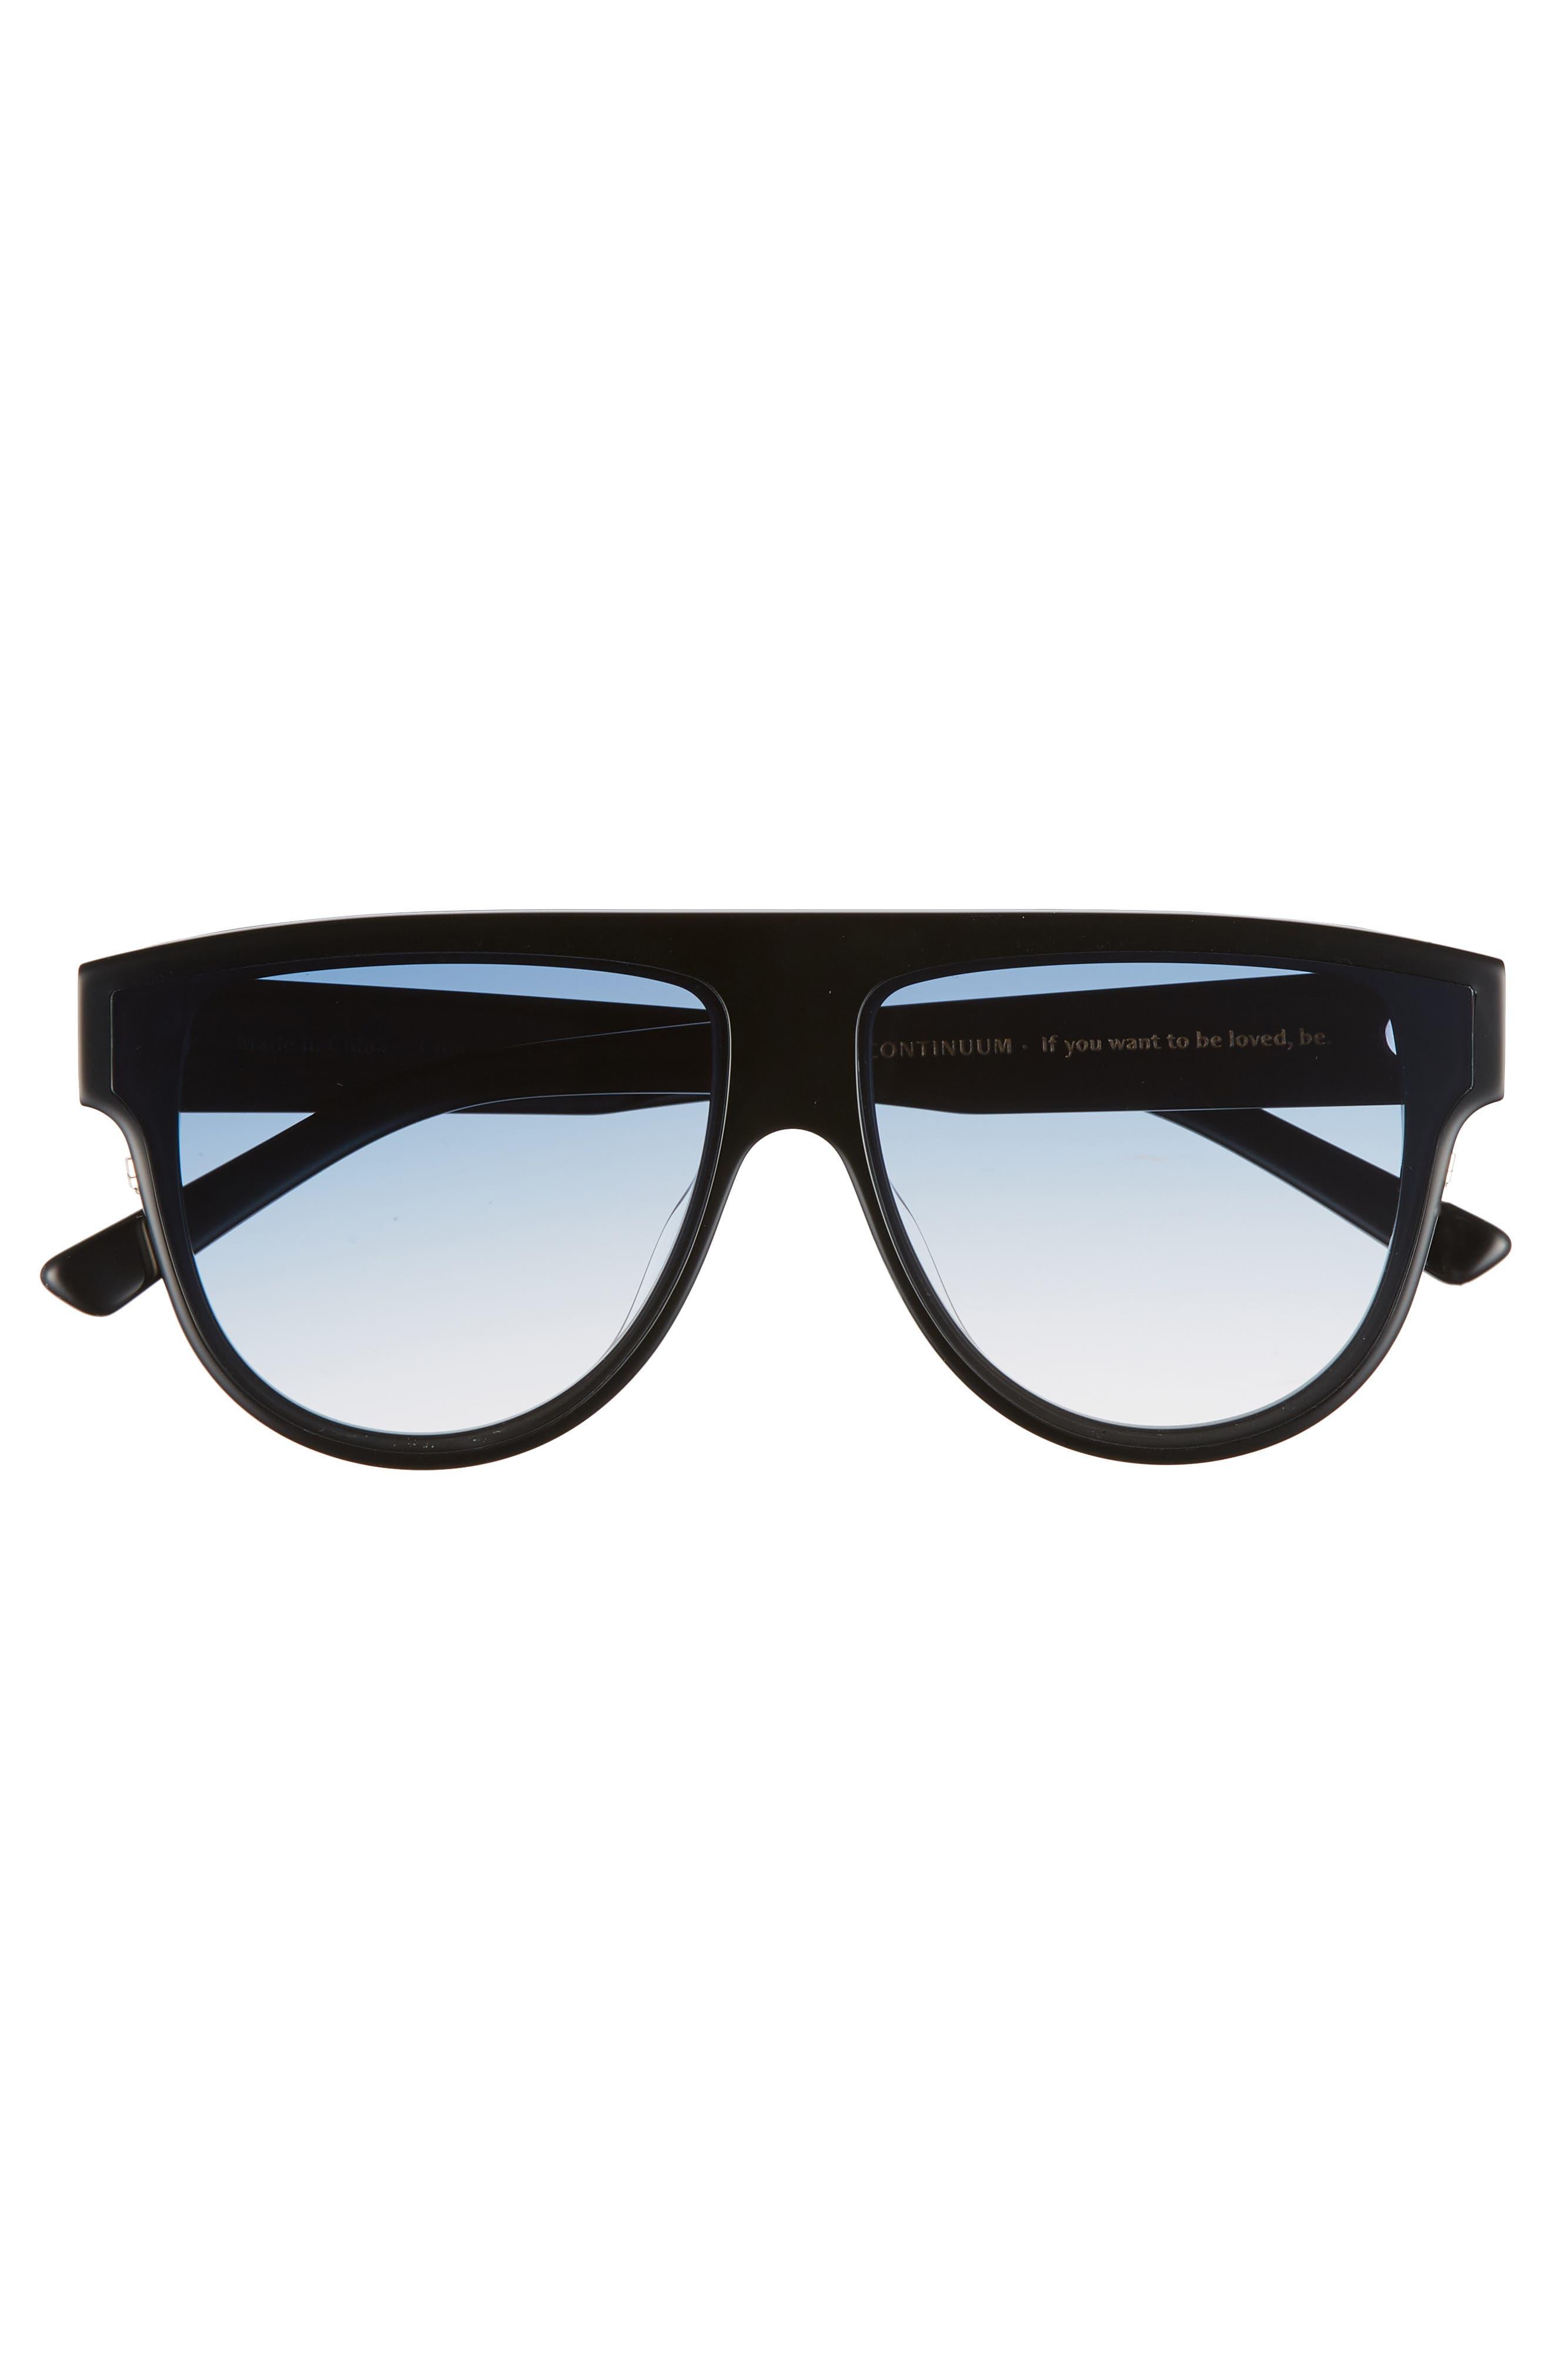 Continuum 63mm Oversize Flat Top Sunglasses,                             Alternate thumbnail 3, color,                             Blue Gradient